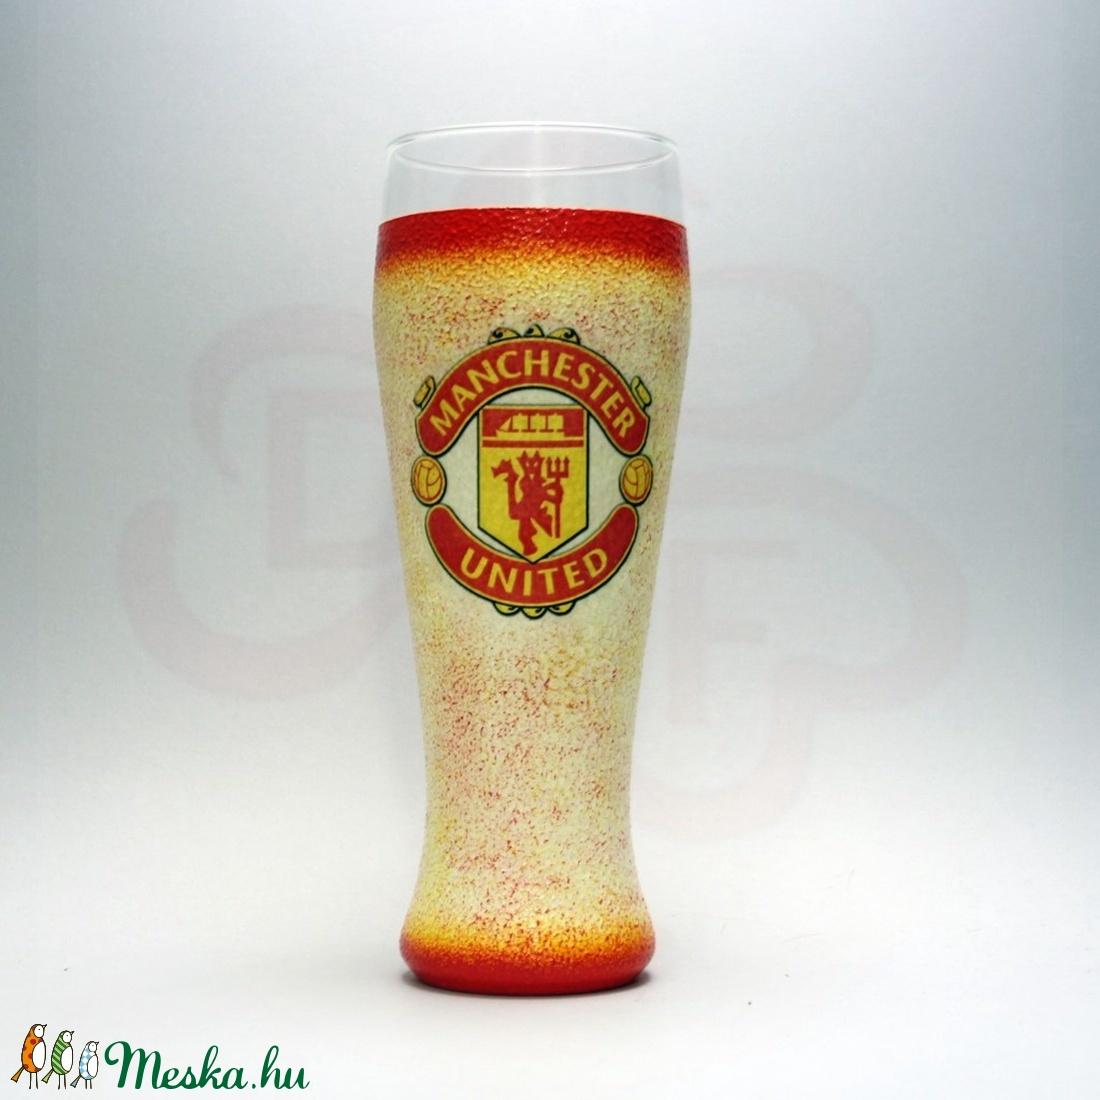 Manchester United sörös pohár; futball szurkolóknak (decorfantasy) - Meska.hu